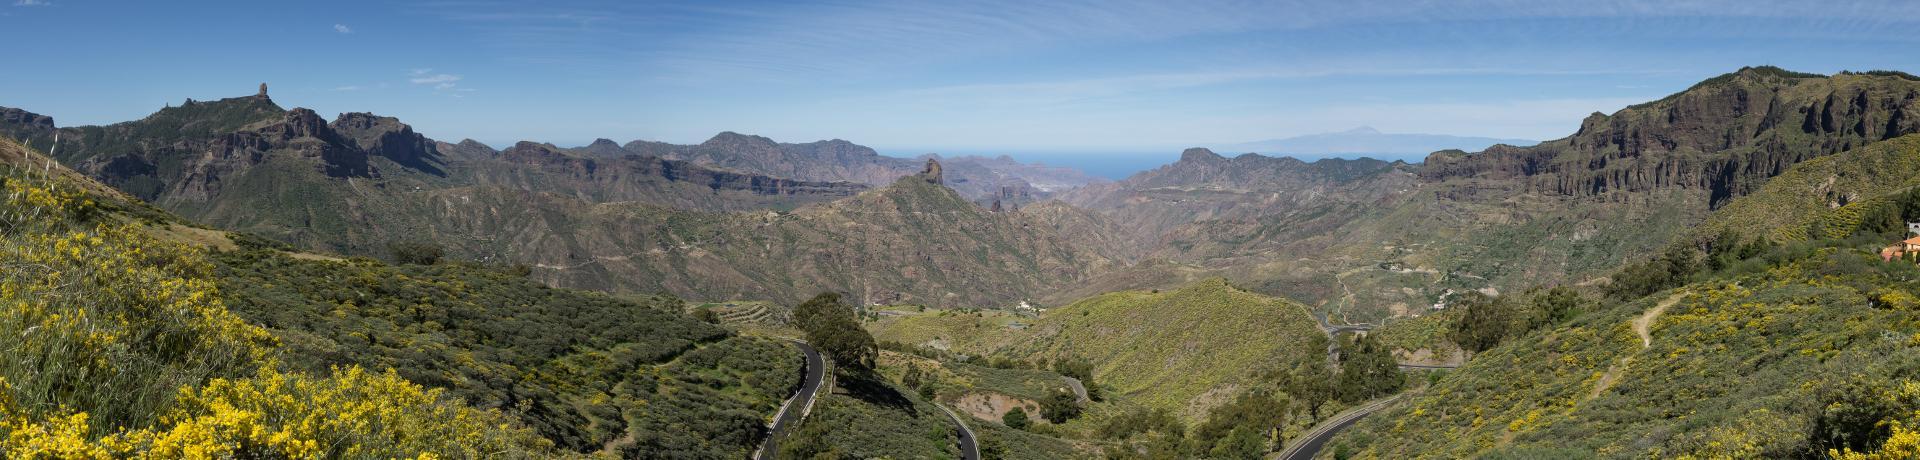 Gran Canaria - Emotion